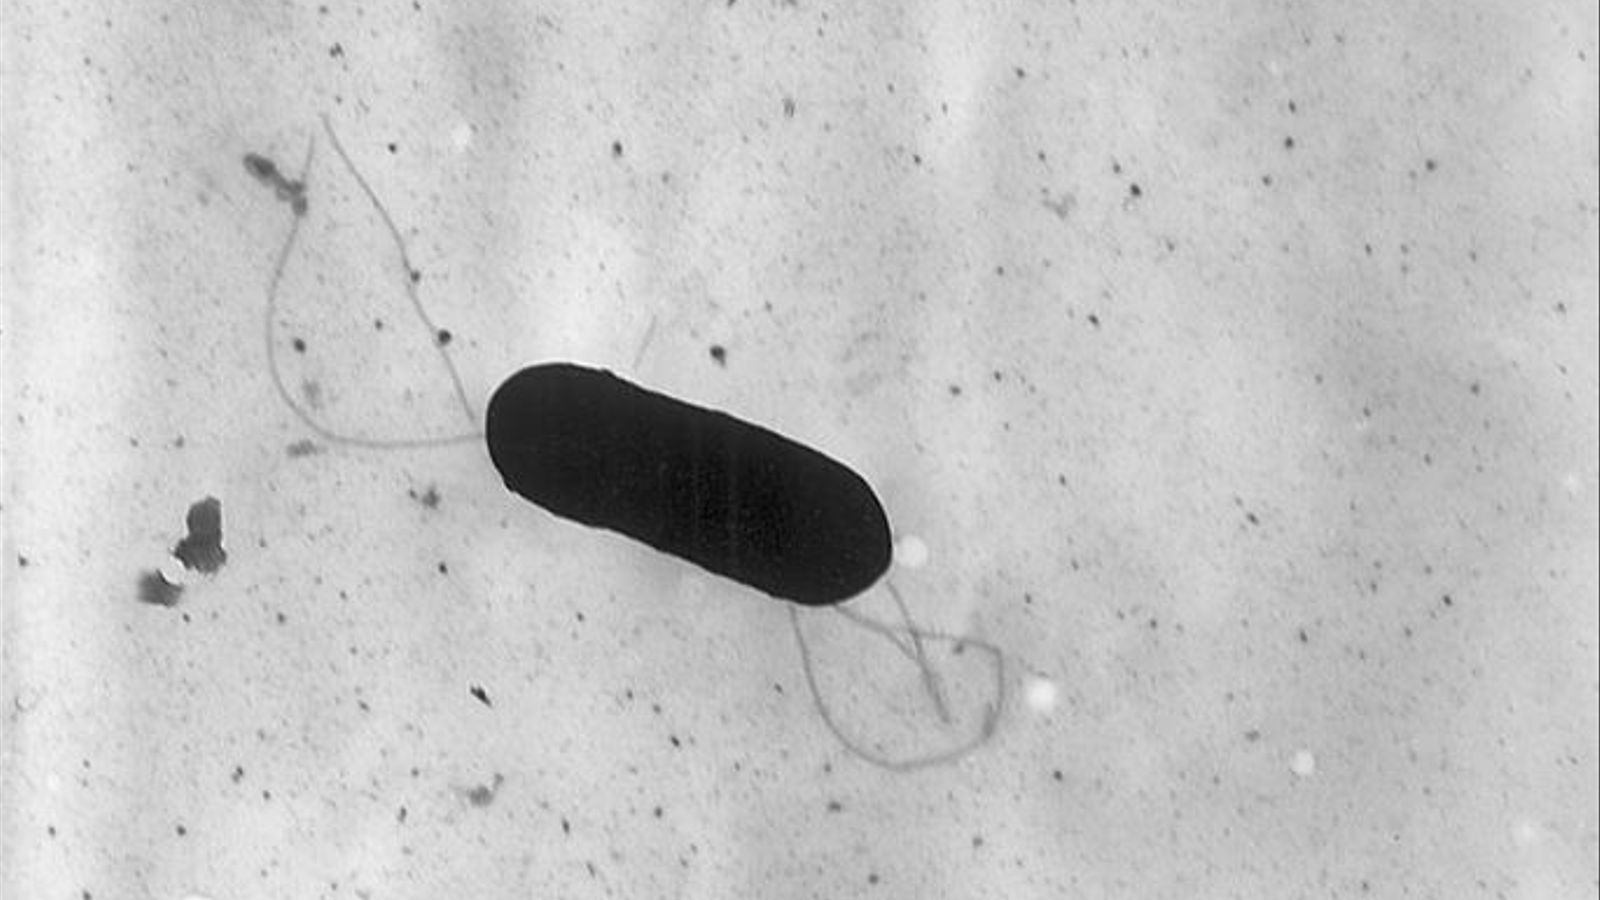 El bacteri 'Listeria monocytogenes'